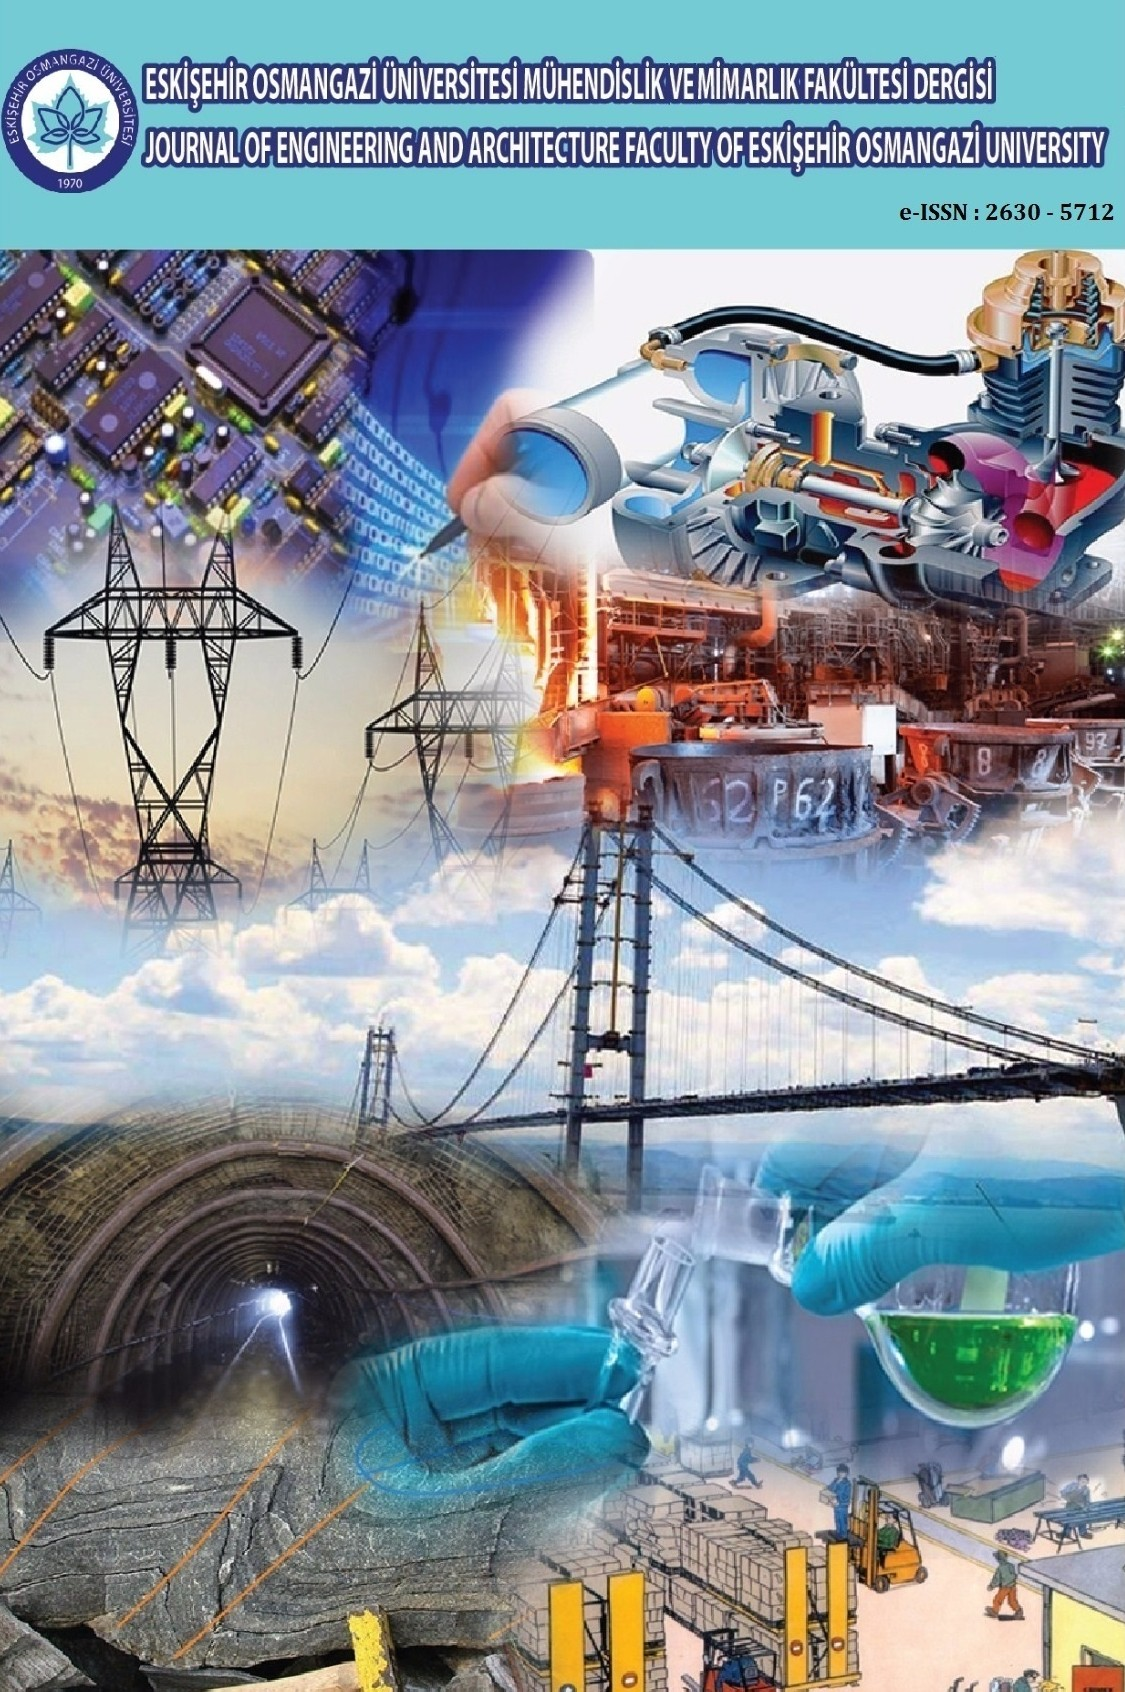 Journal of Engineering and Architecture Faculty of Eskisehir Osmangazi University